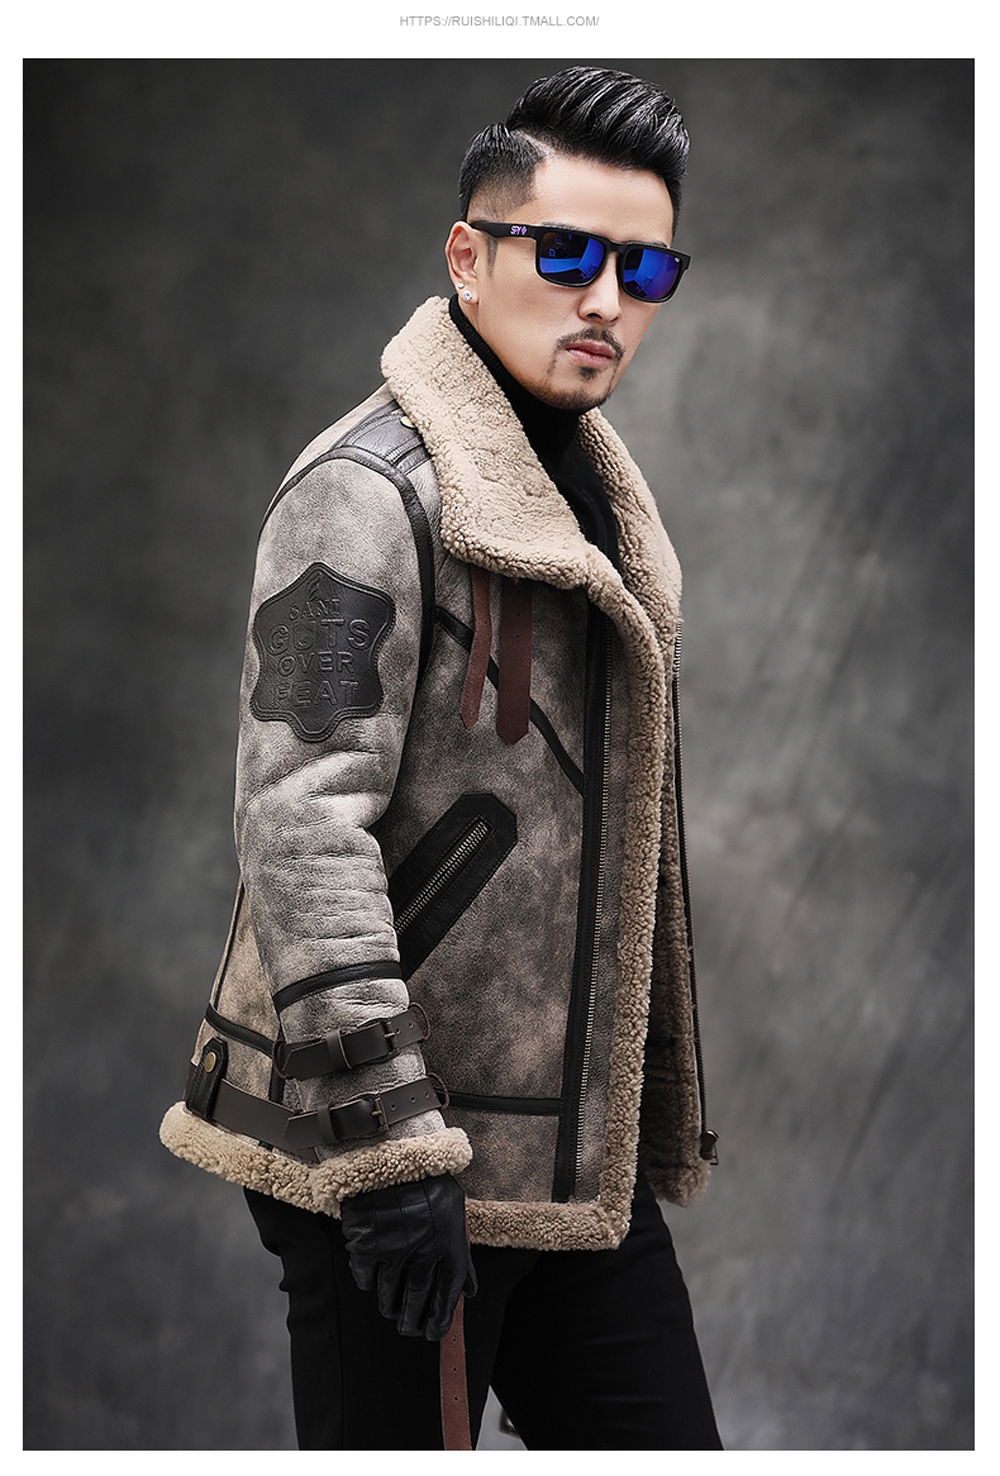 H709b3972c54c47c2967b0478525071fem 2019 Fashion 100% Quality Real Sheepskin Fur Men Coat Genuine Full Pelt Sheep Shearling Male Winter Jacket Brown Men Fur Outwear